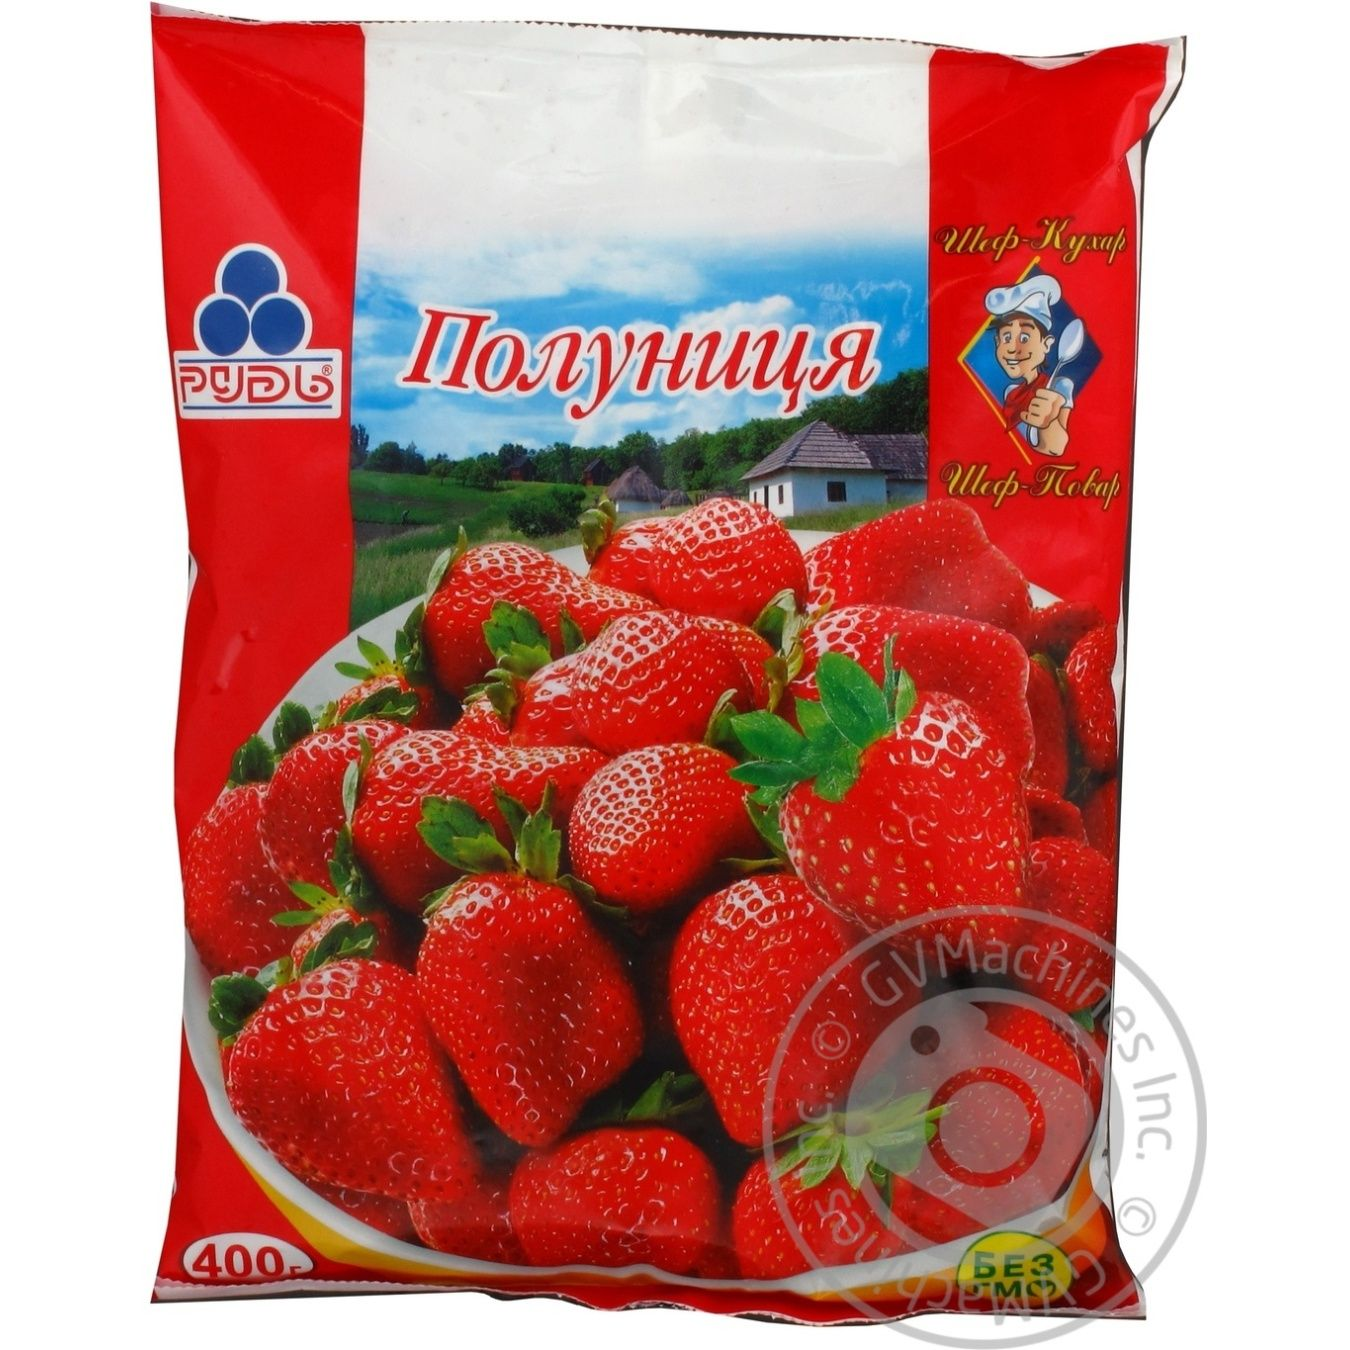 berry strawberry Rud frozen 400g → Frozen → Fruits